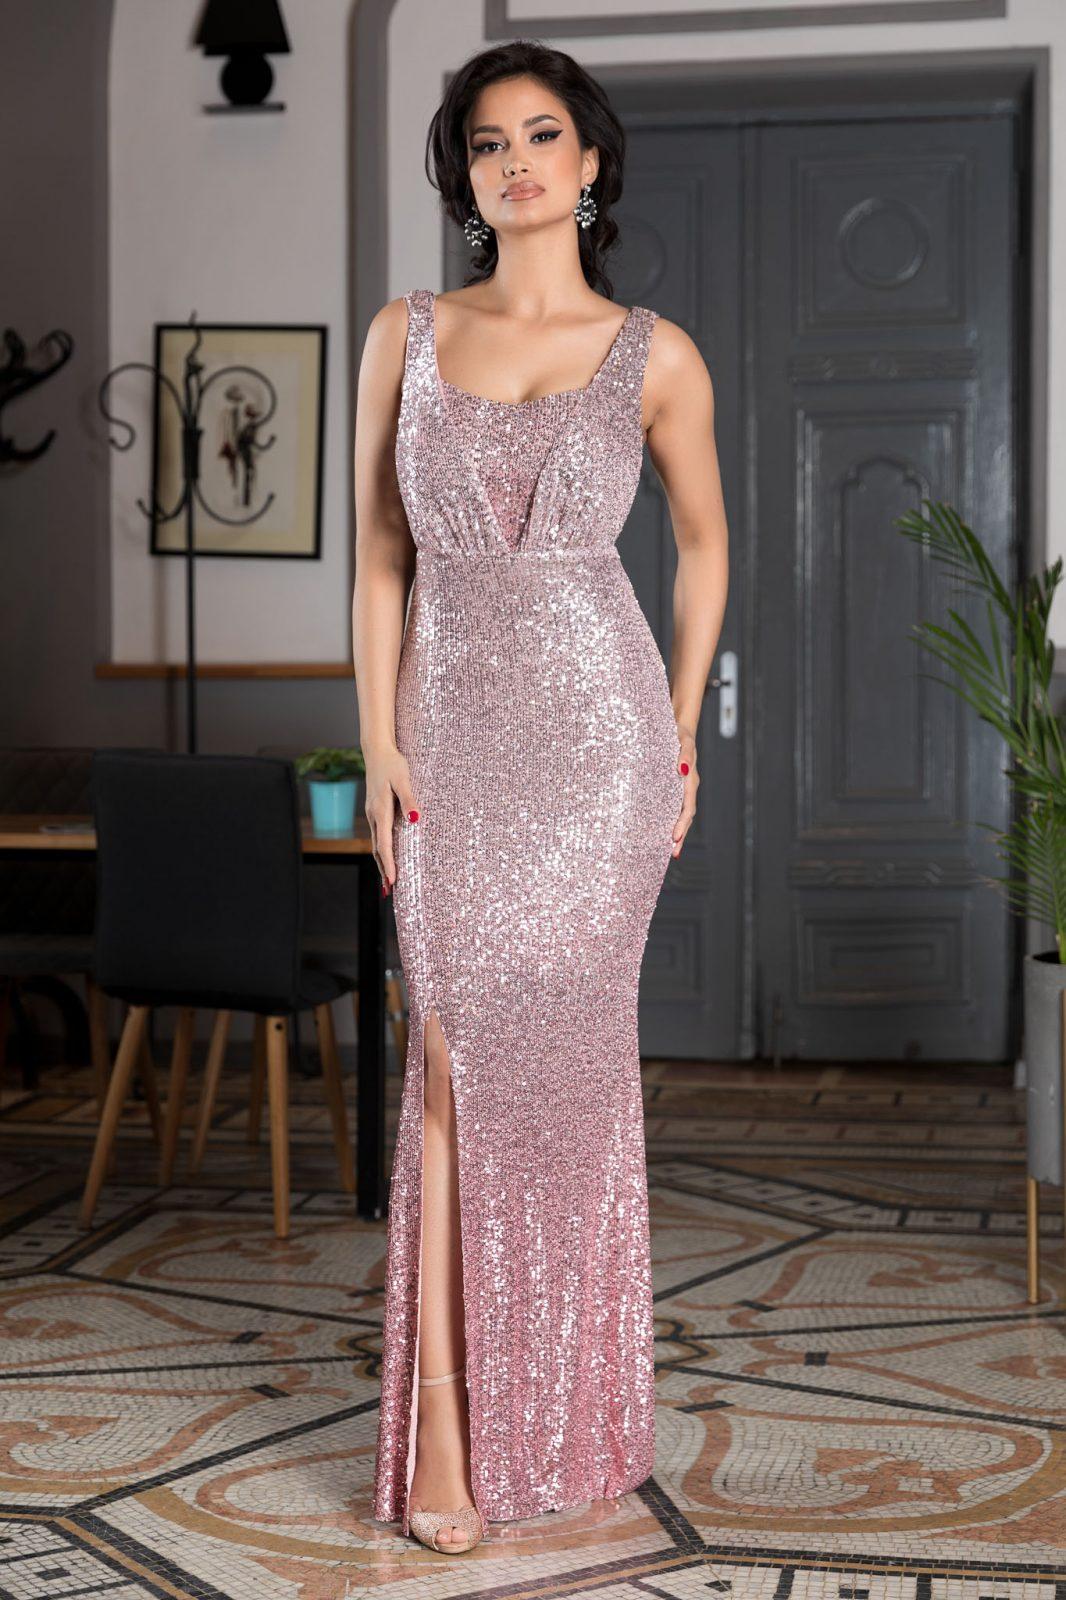 Night Diva Ροζ Φόρεμα 4580